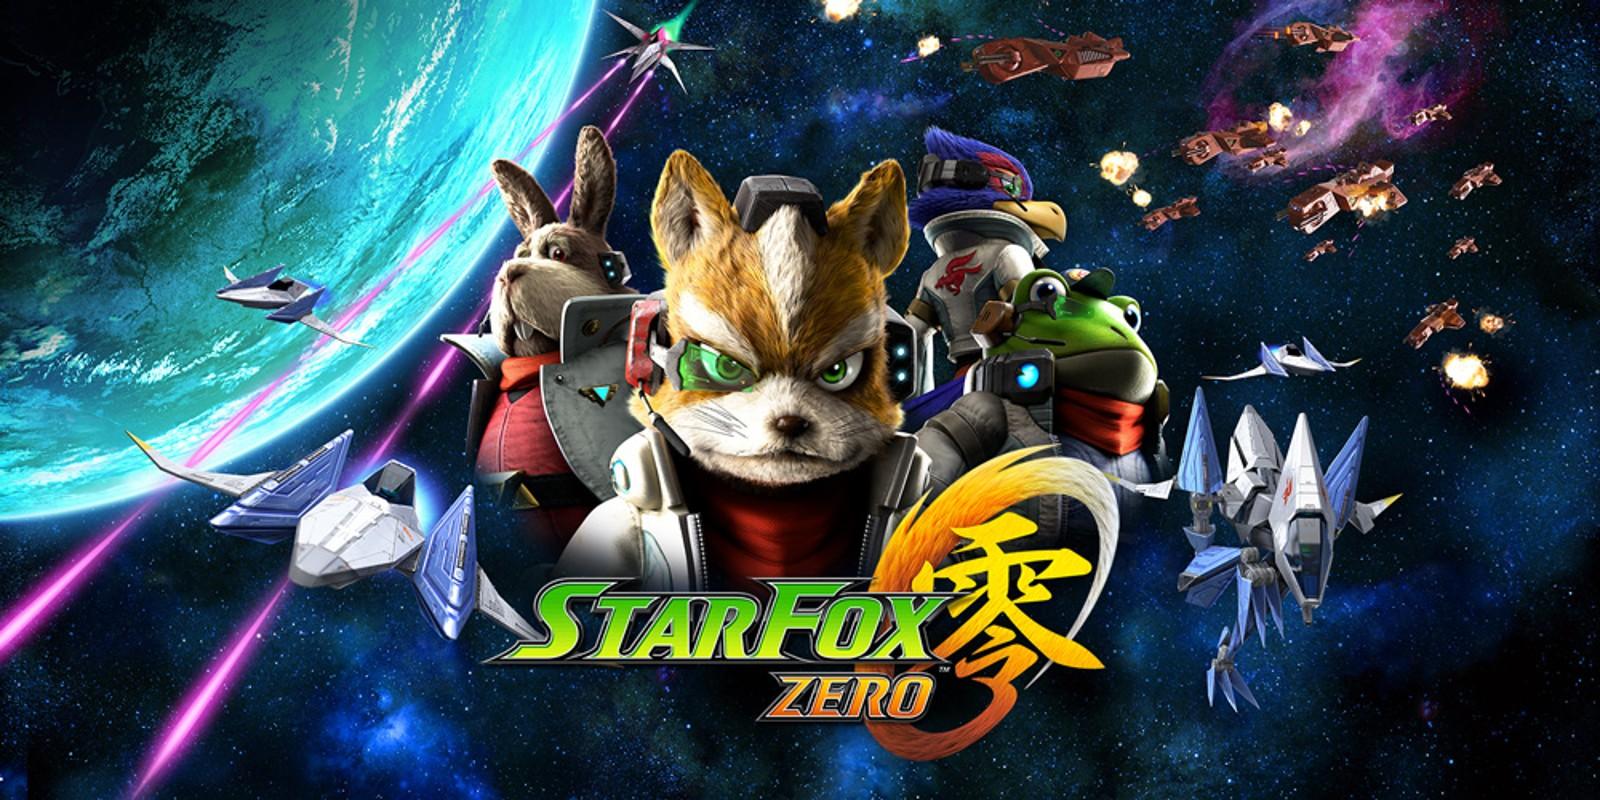 IMAGE(https://cdn02.nintendo-europe.com/media/images/10_share_images/games_15/wiiu_14/SI_WiiU_StarFoxZero_image1600w.jpg)